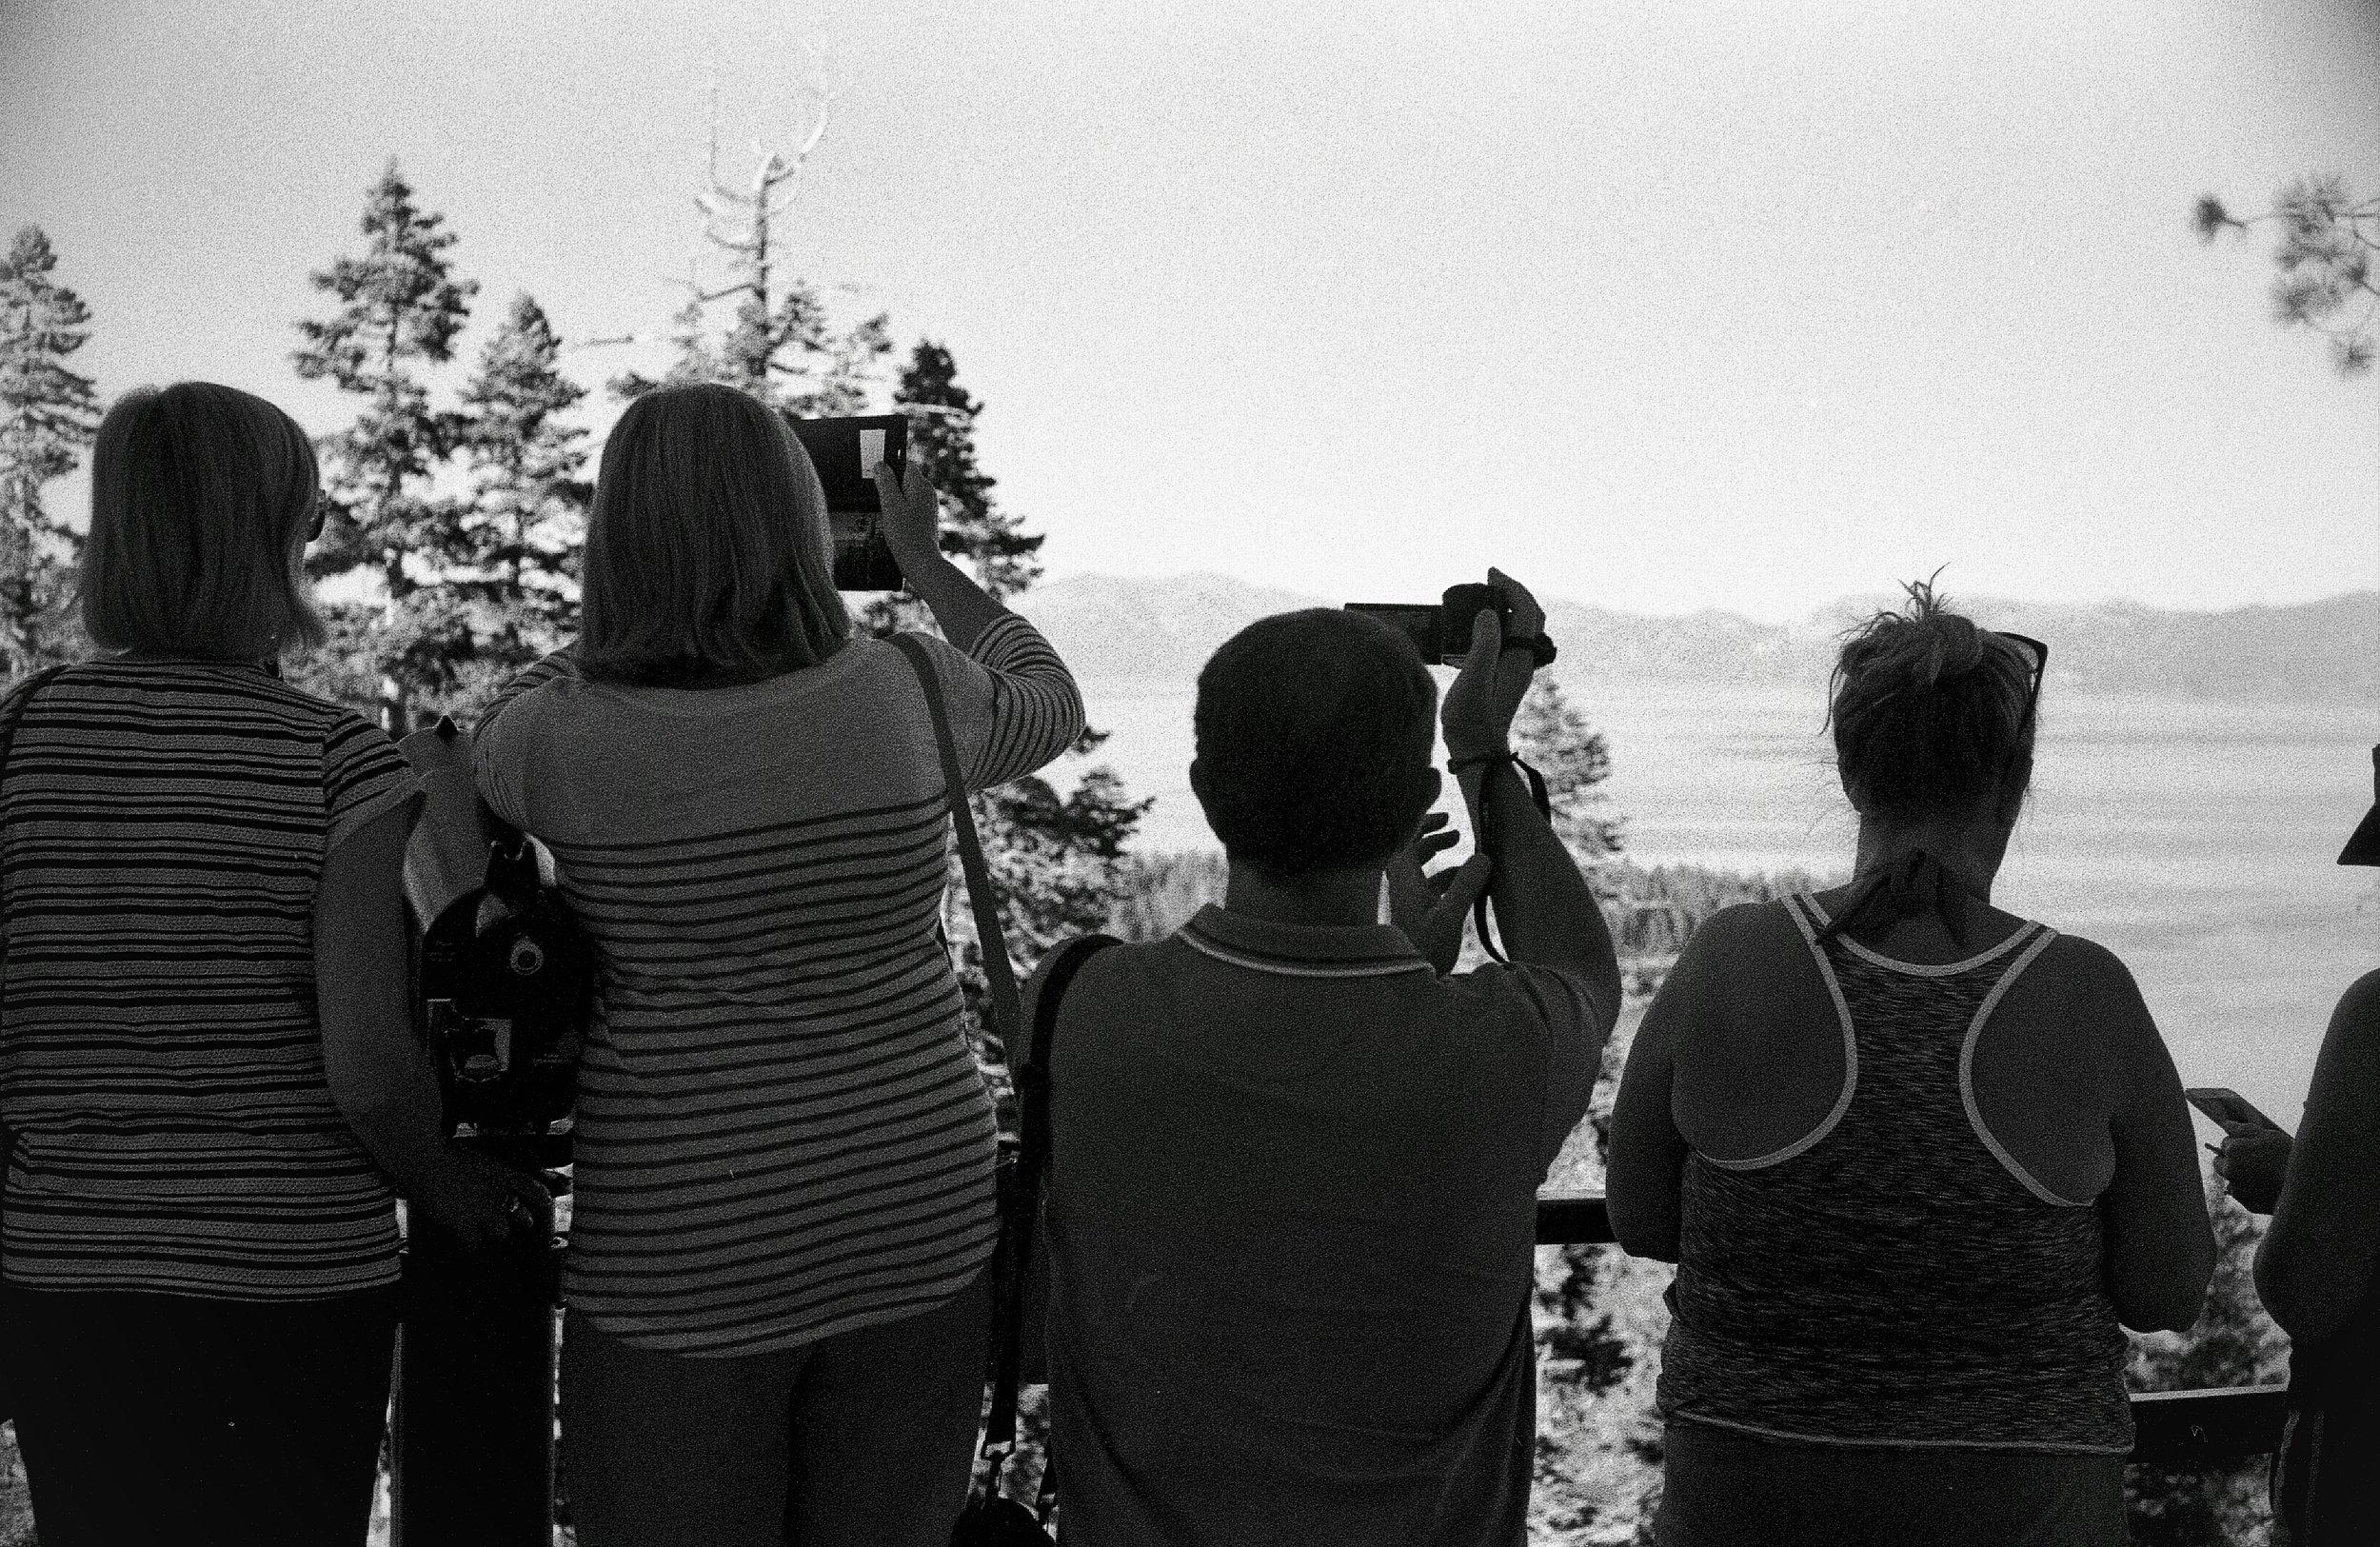 Hank Beckmeyer | Tourist | Leica M7 | Sonnetar 50 1.1 |  Tri-X